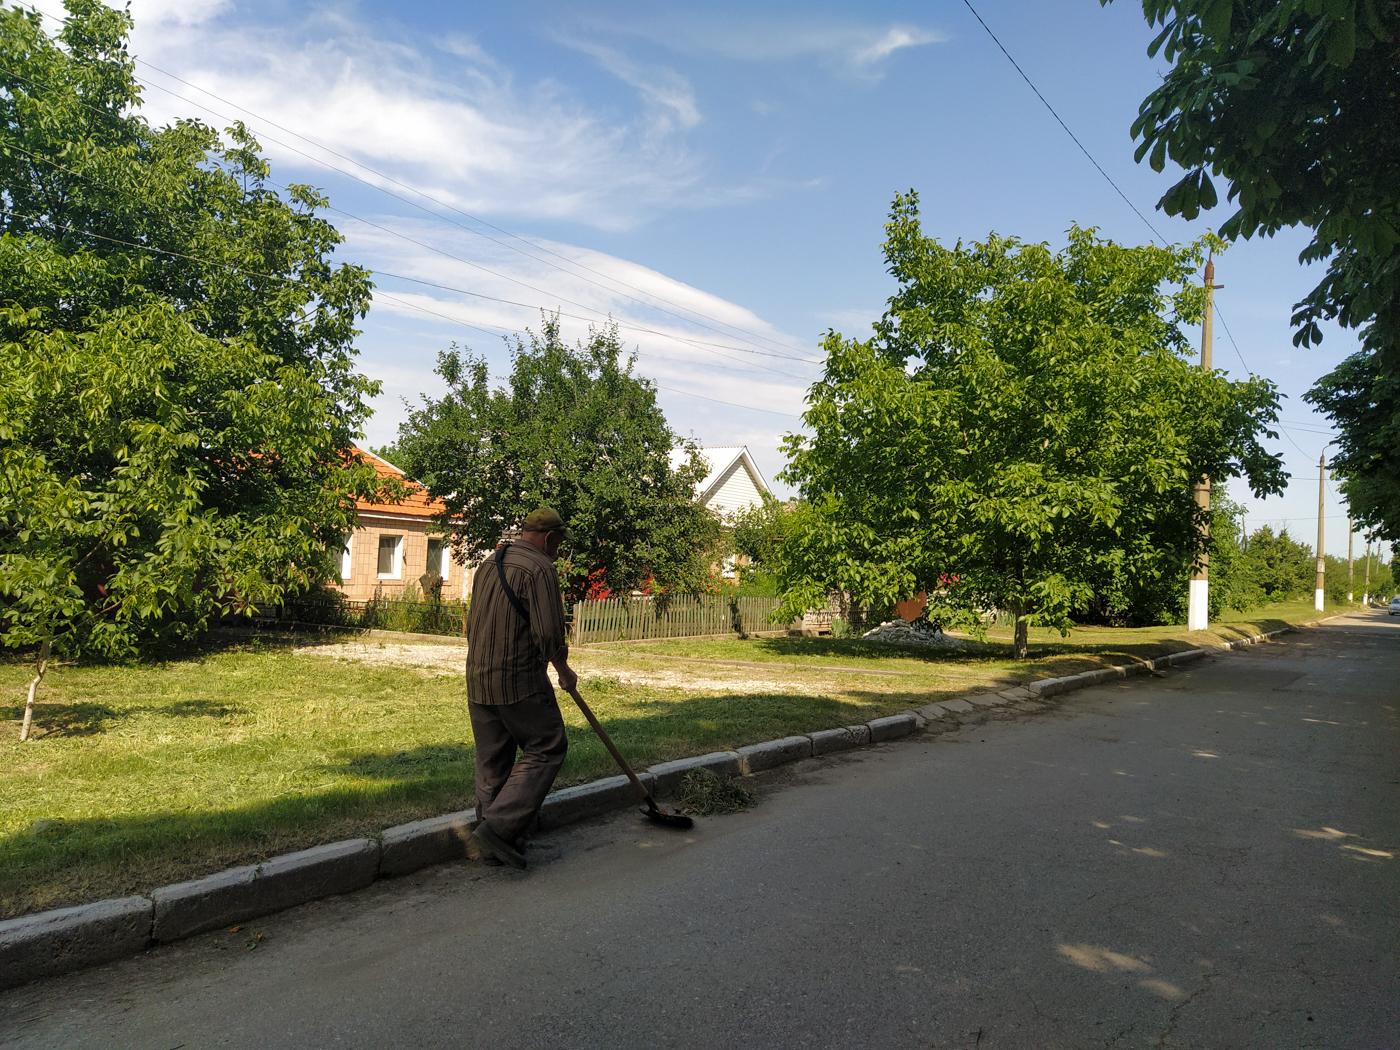 Активисты ОД «Мир Луганщине» провели субботник в посёлке Металлист 2